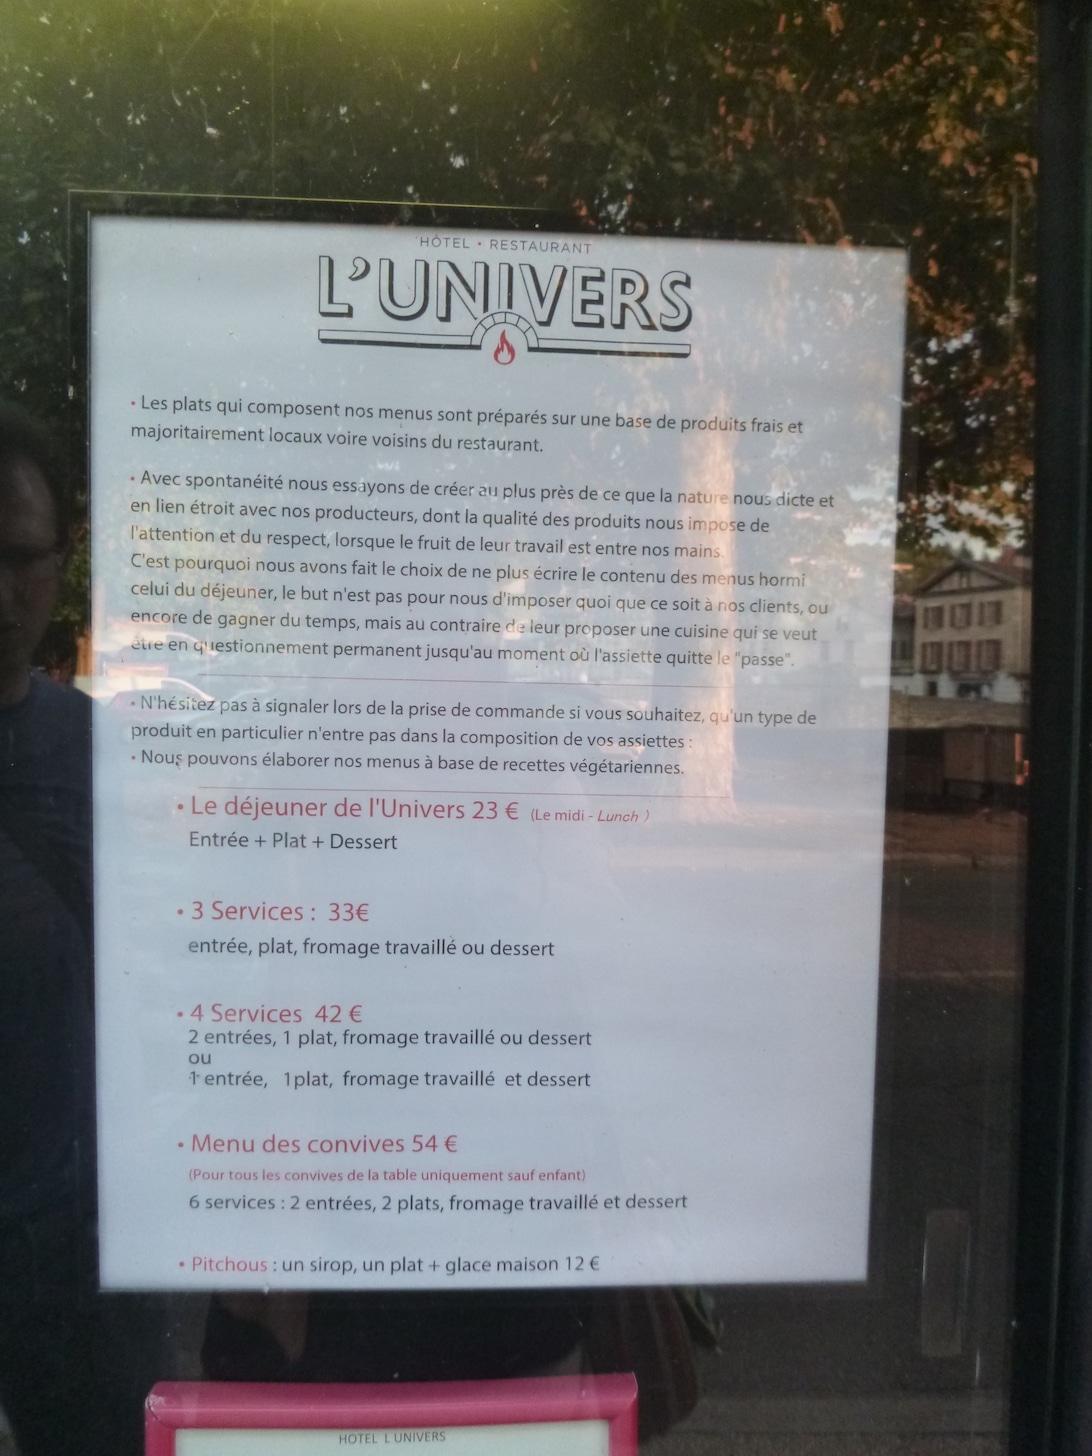 Le menu